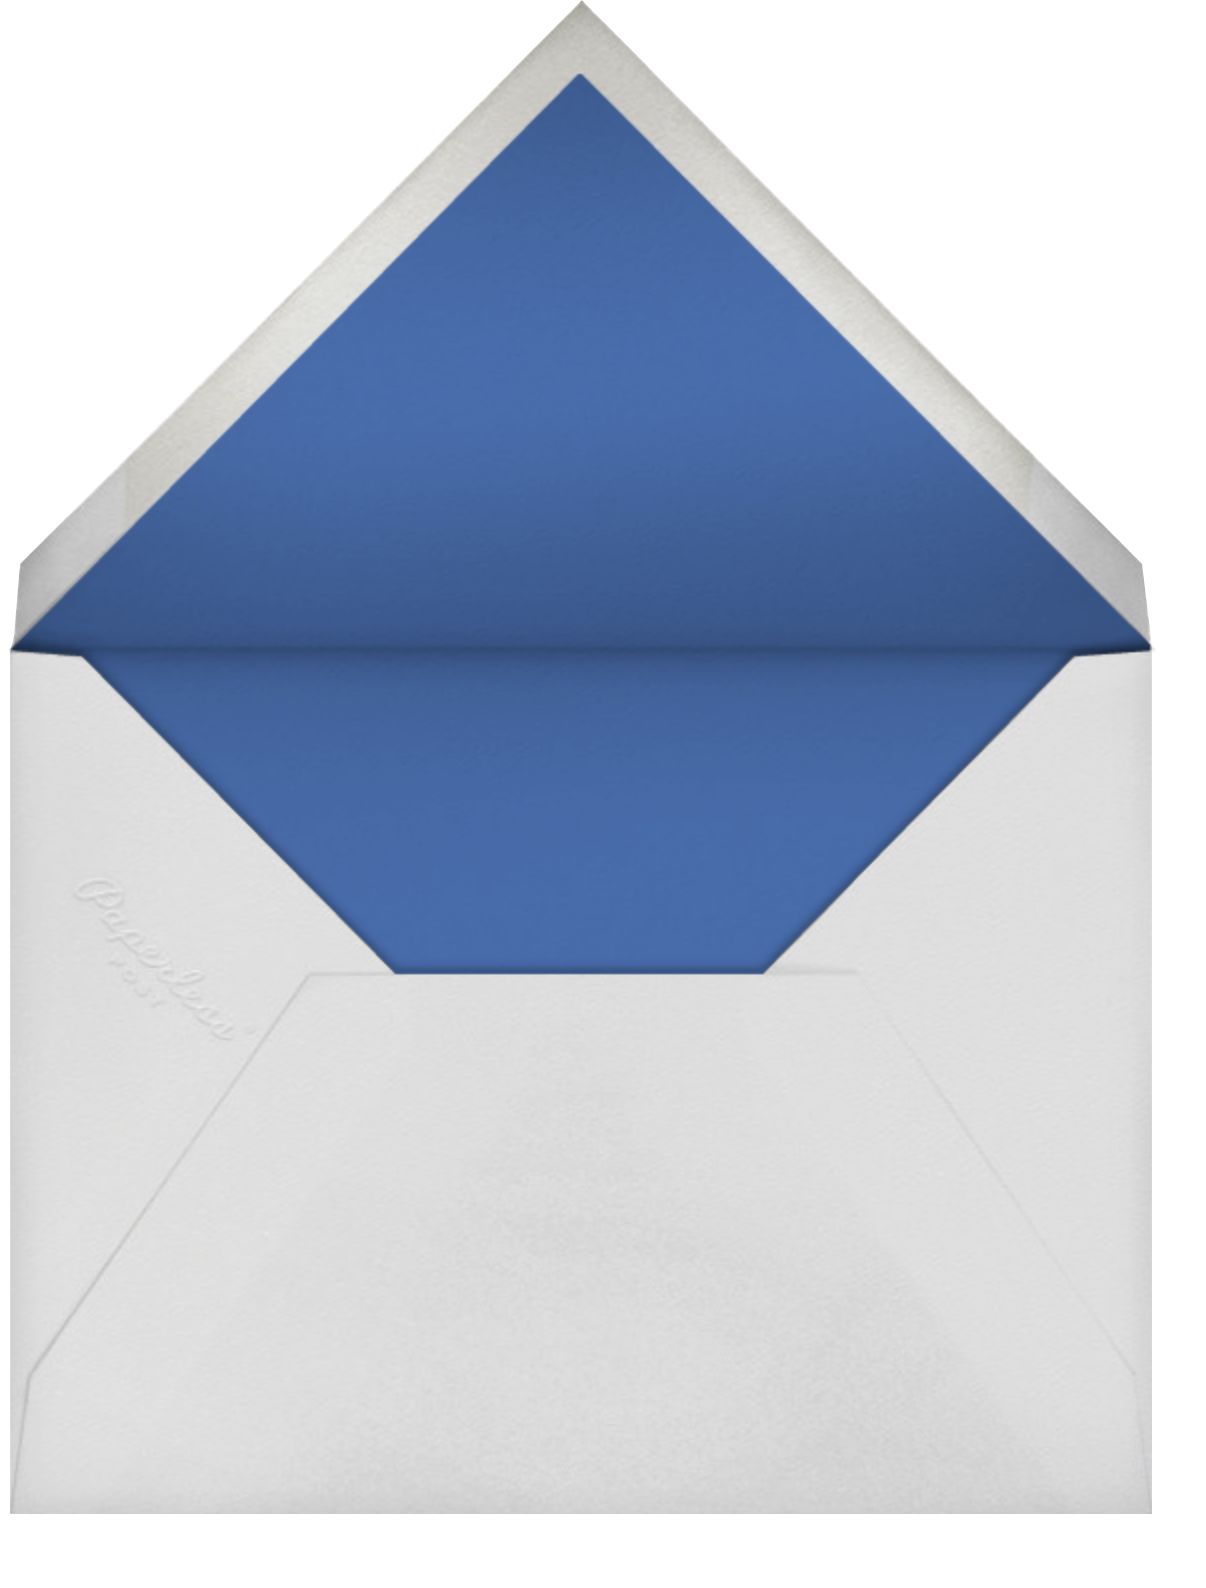 Daybill - Regent Blue - Paperless Post - Engagement party - envelope back